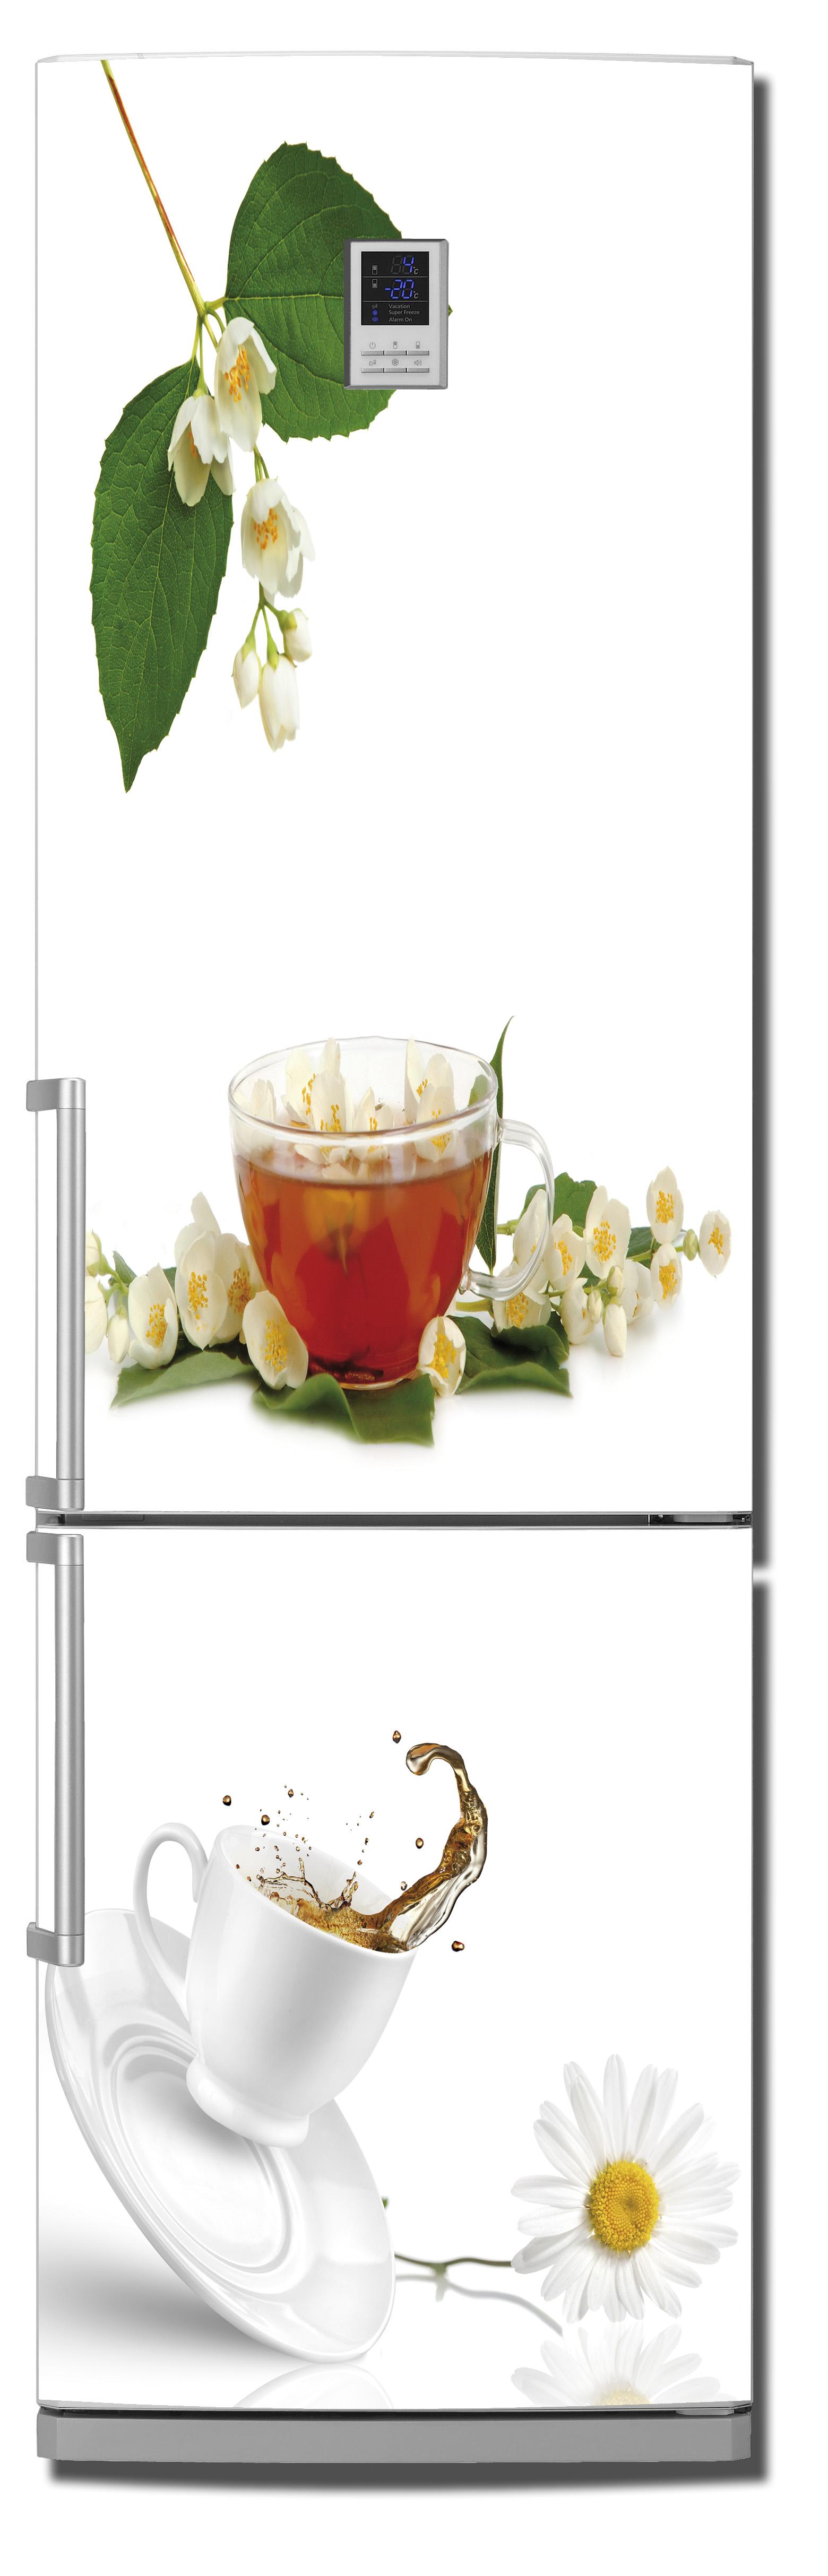 наклейка на холодильник - чай